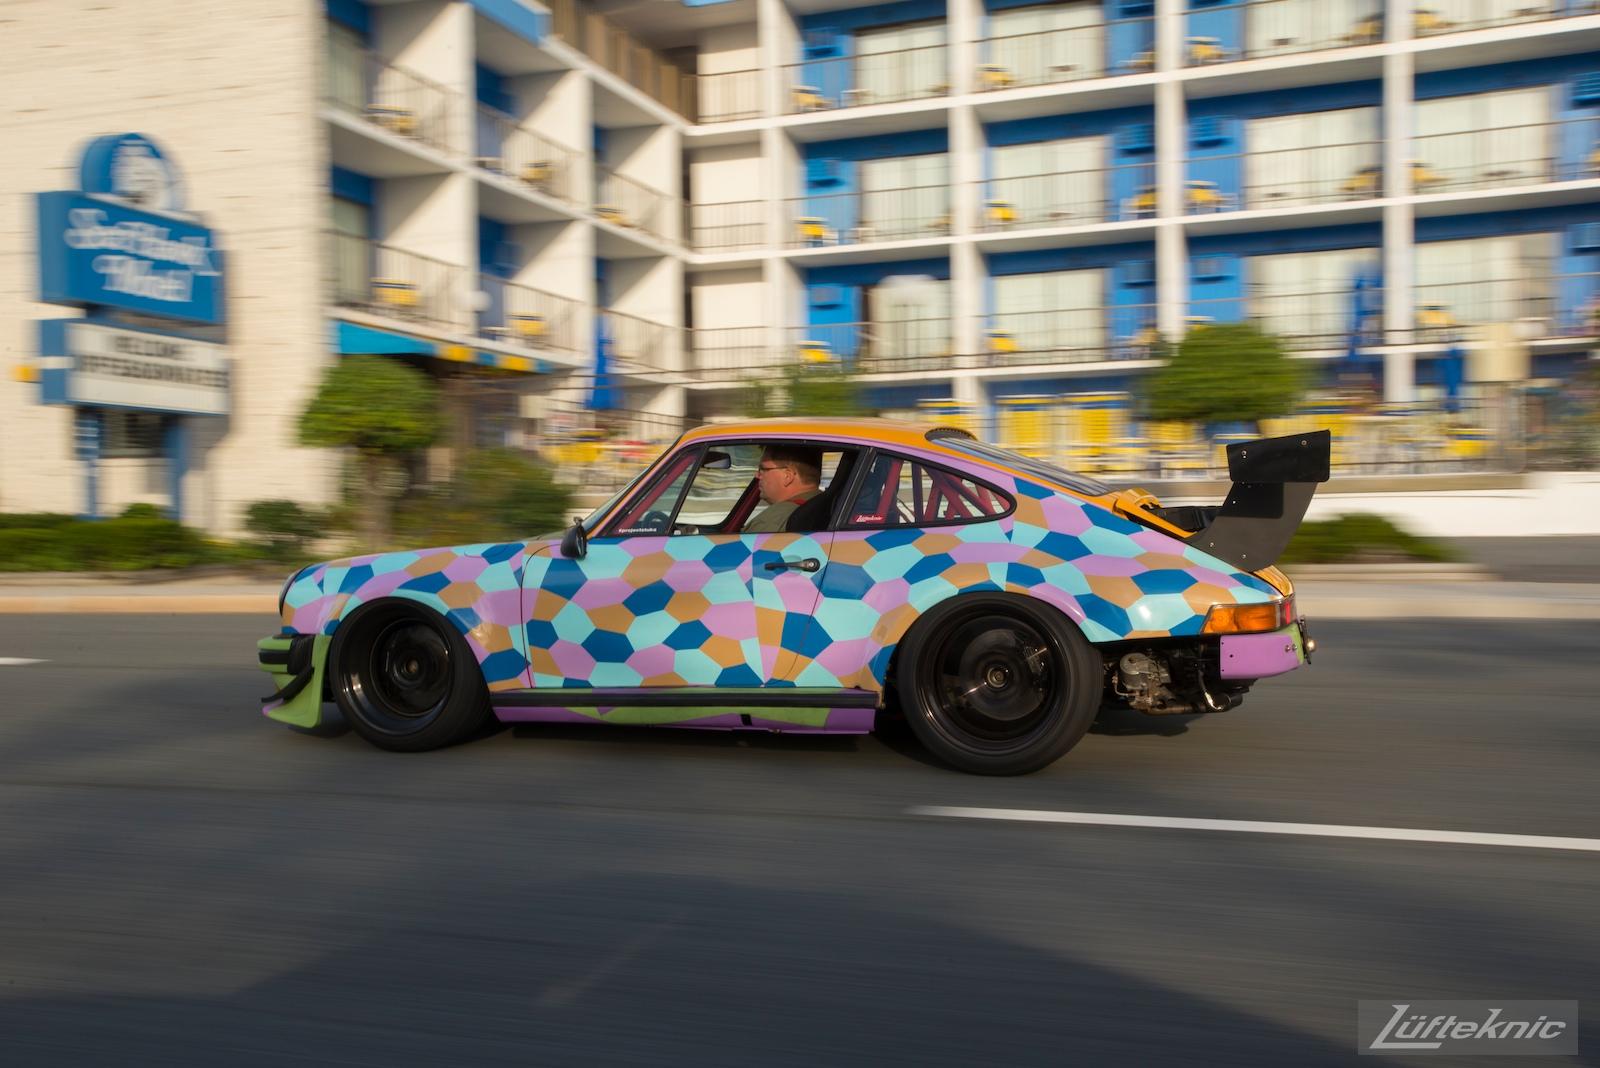 A panning shot of the Lüfteknic #projectstuka Porsche 930 Turbo driving past a hotel